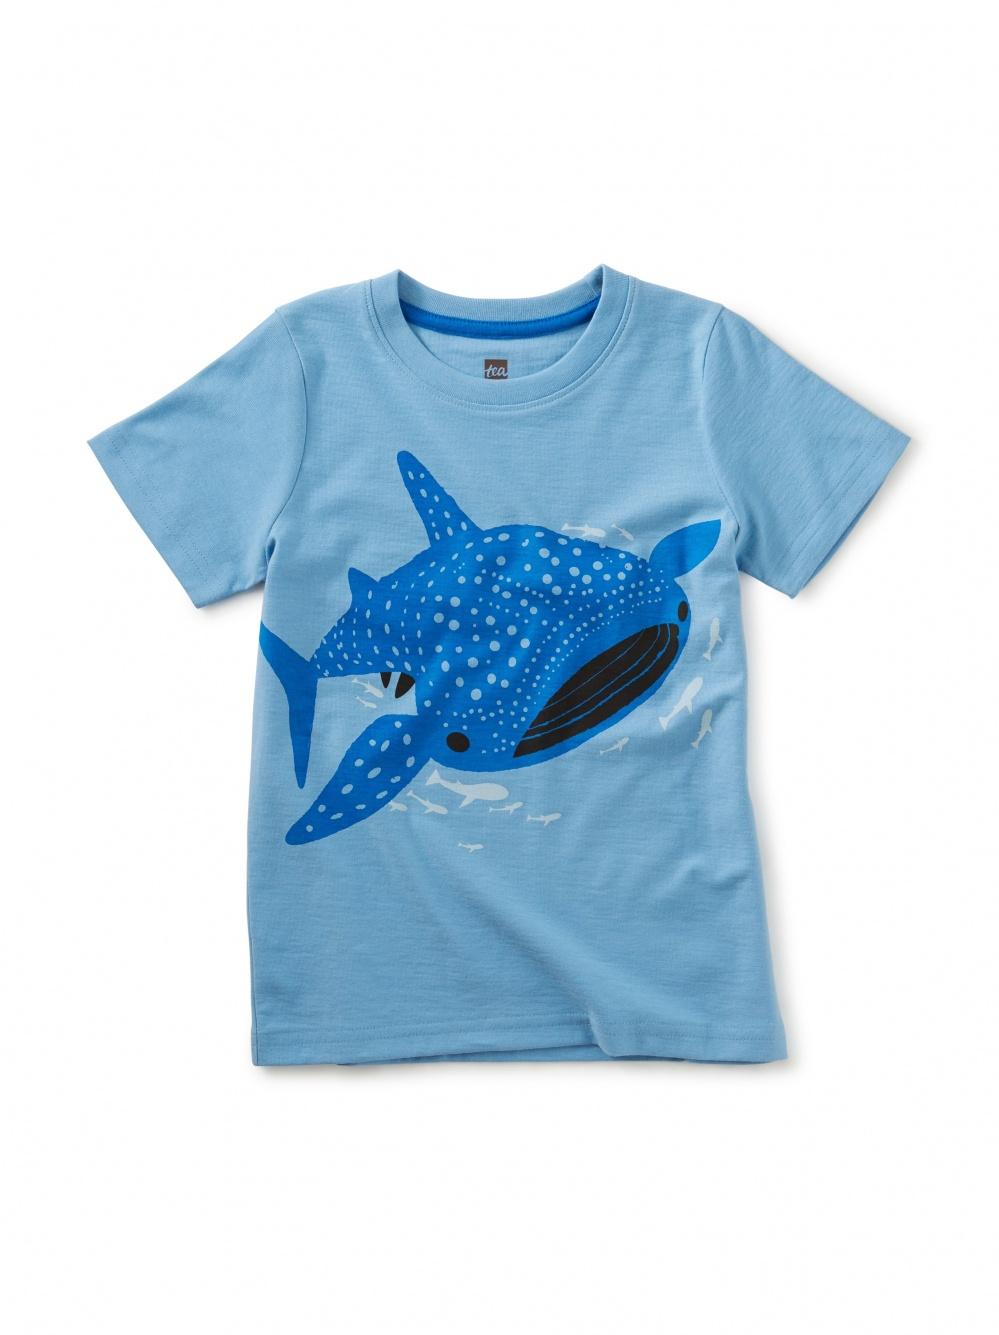 Tattle Whale Shark Tee